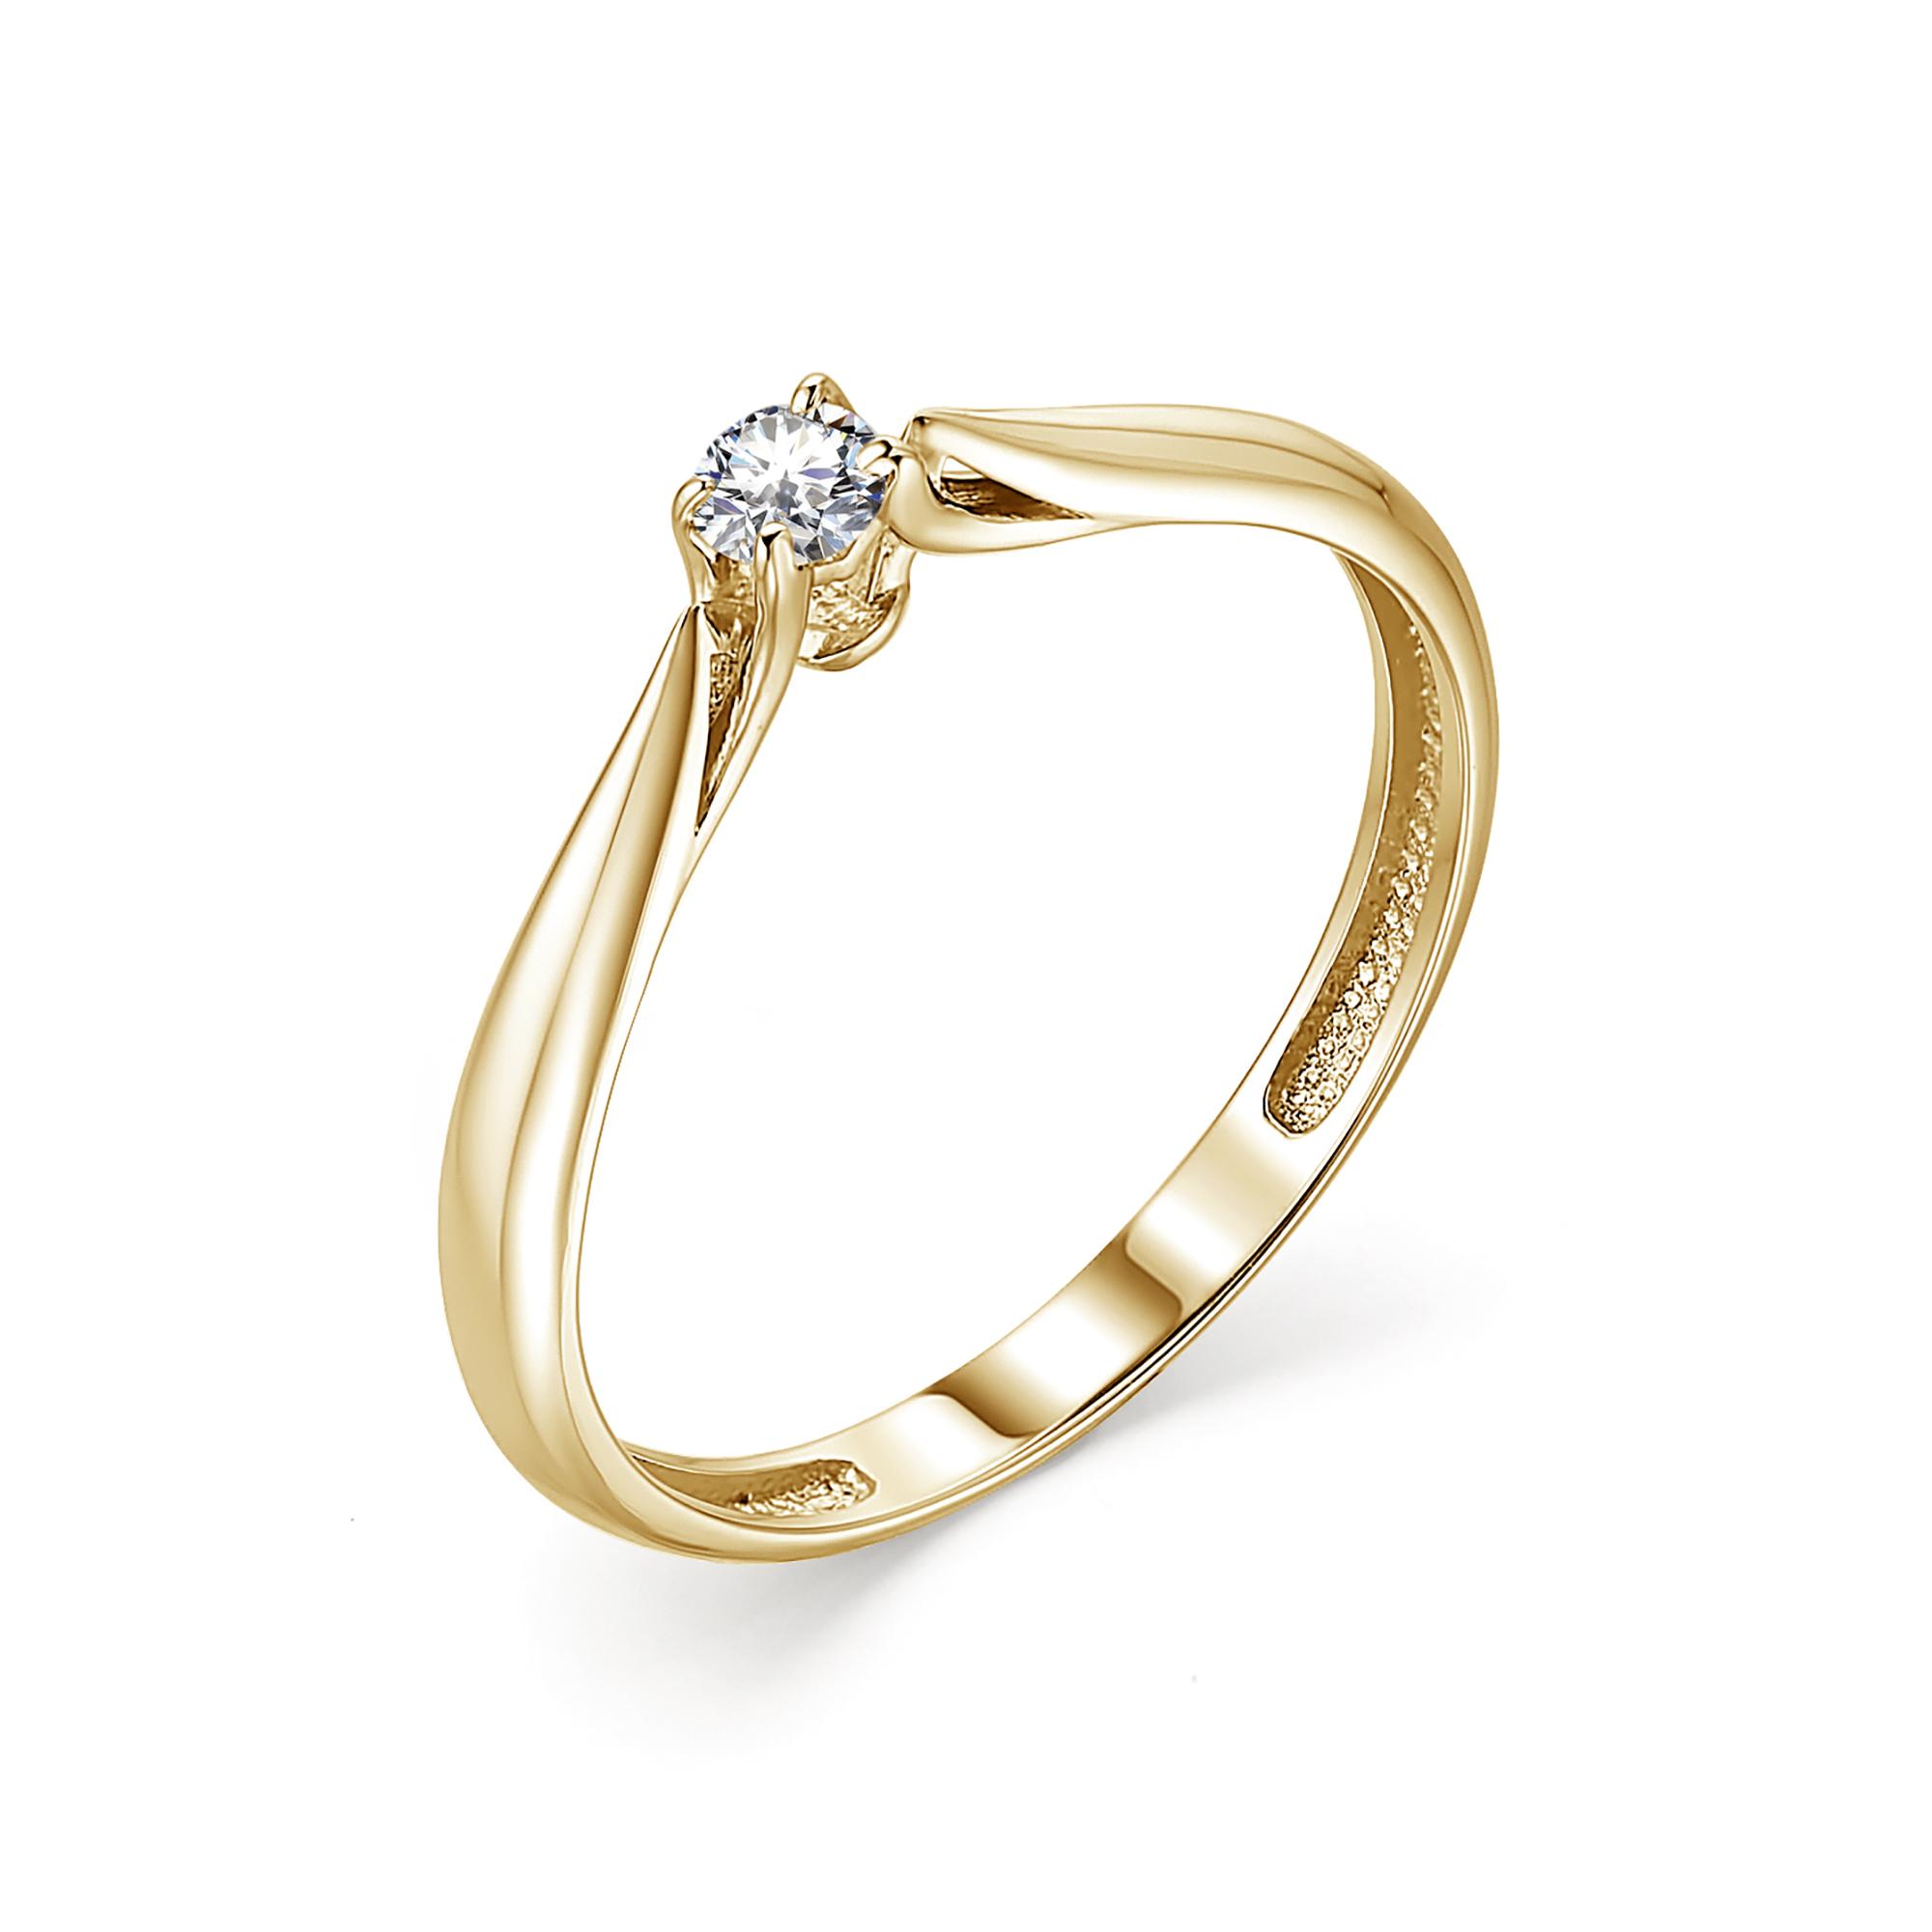 картинка кольцо 13341-300 1 бриллиант круг 57 0,085 10-15 4/6а 13341-300